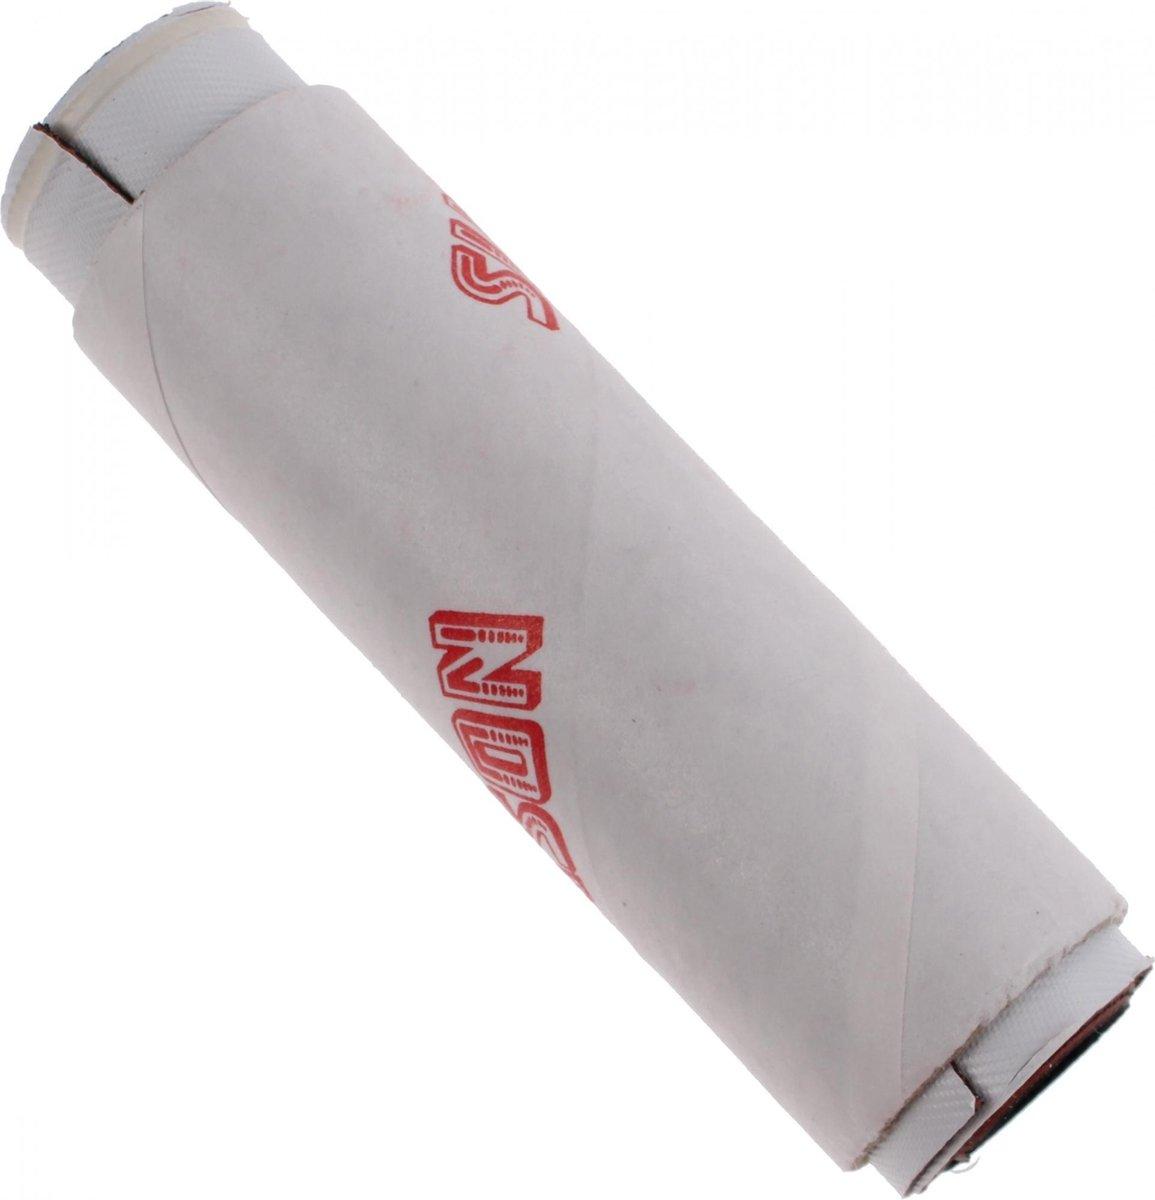 Simson Bandreparatie pleister Rol 7*20cm